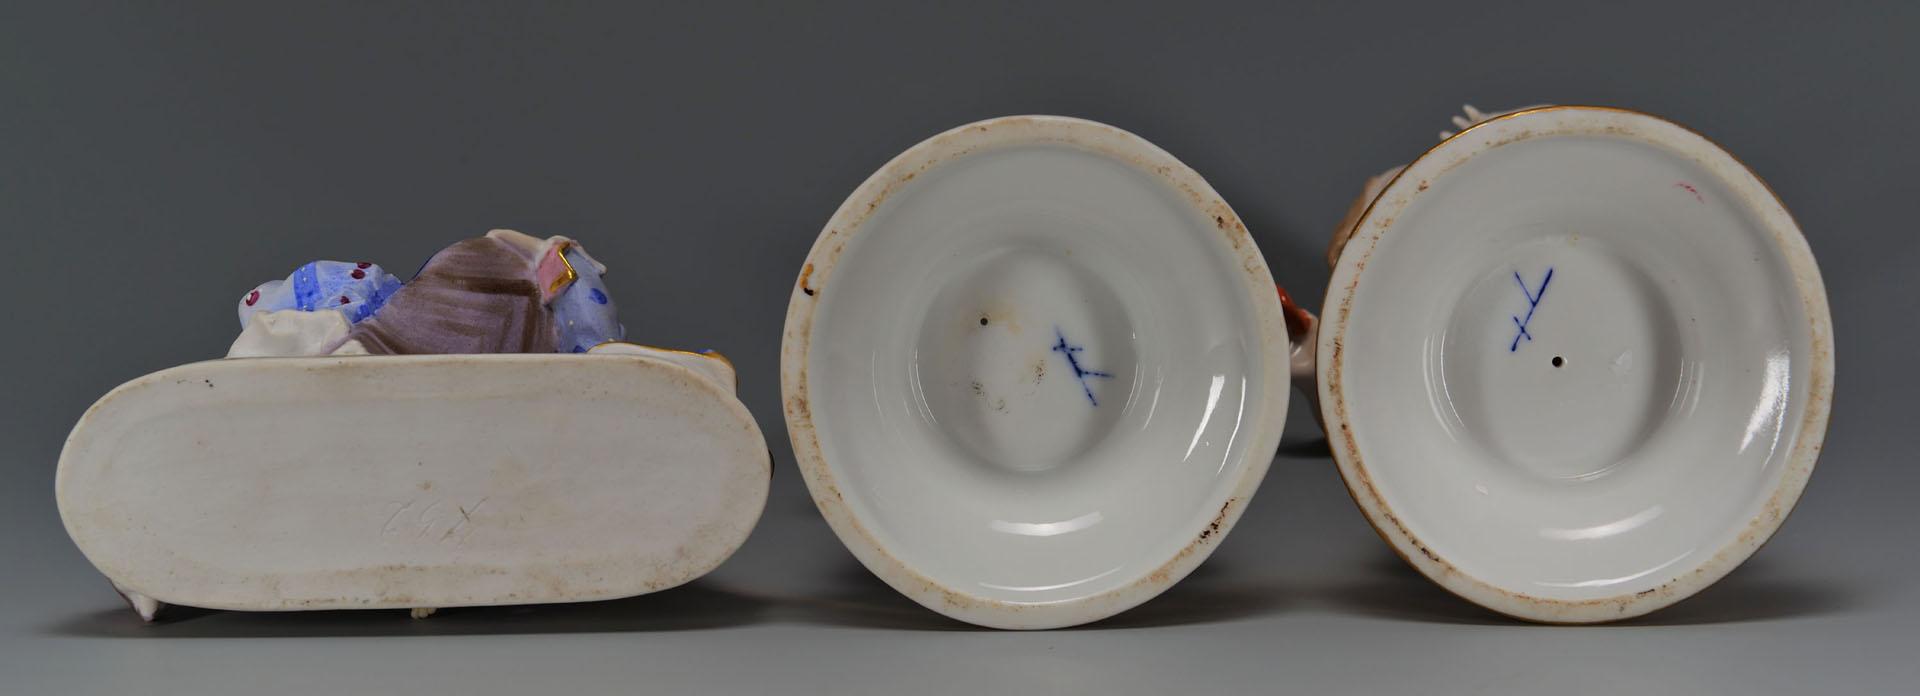 Lot 428: 3 German Porcelain Figures